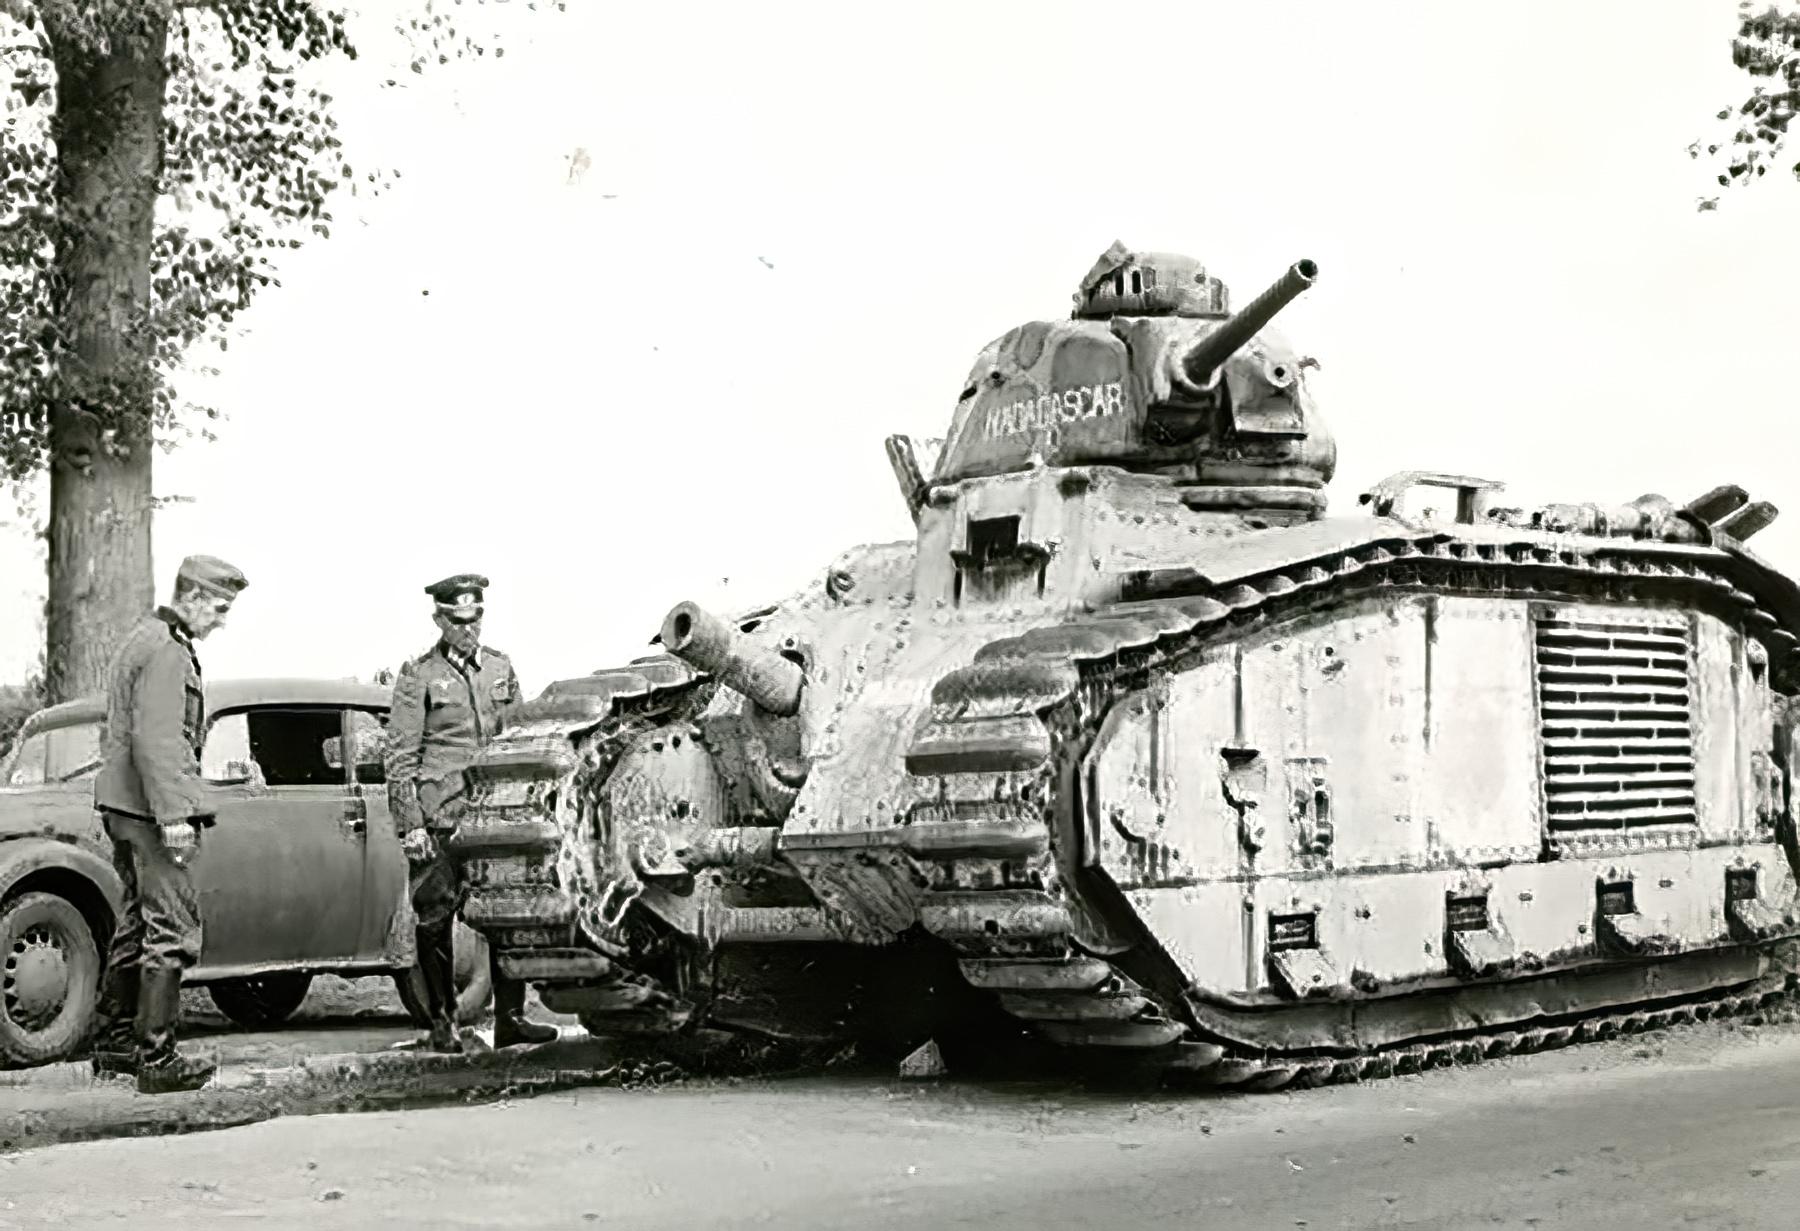 French Army Renault Char B1bis named Madagascar captured battle of France ebay 01